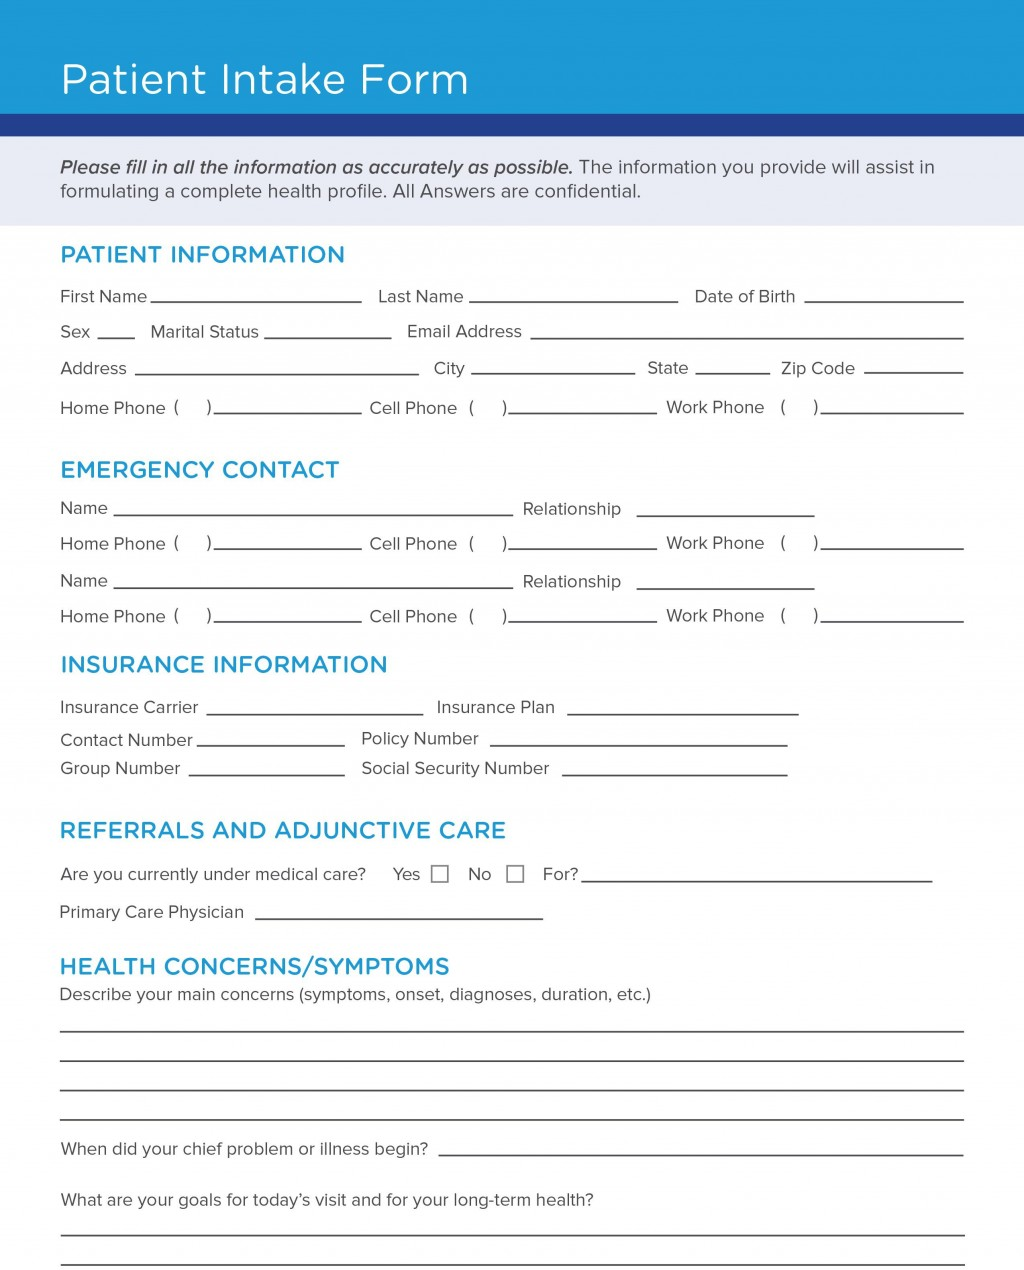 008 Excellent Patient Intake Form Template Design  Word Client Excel PdfLarge